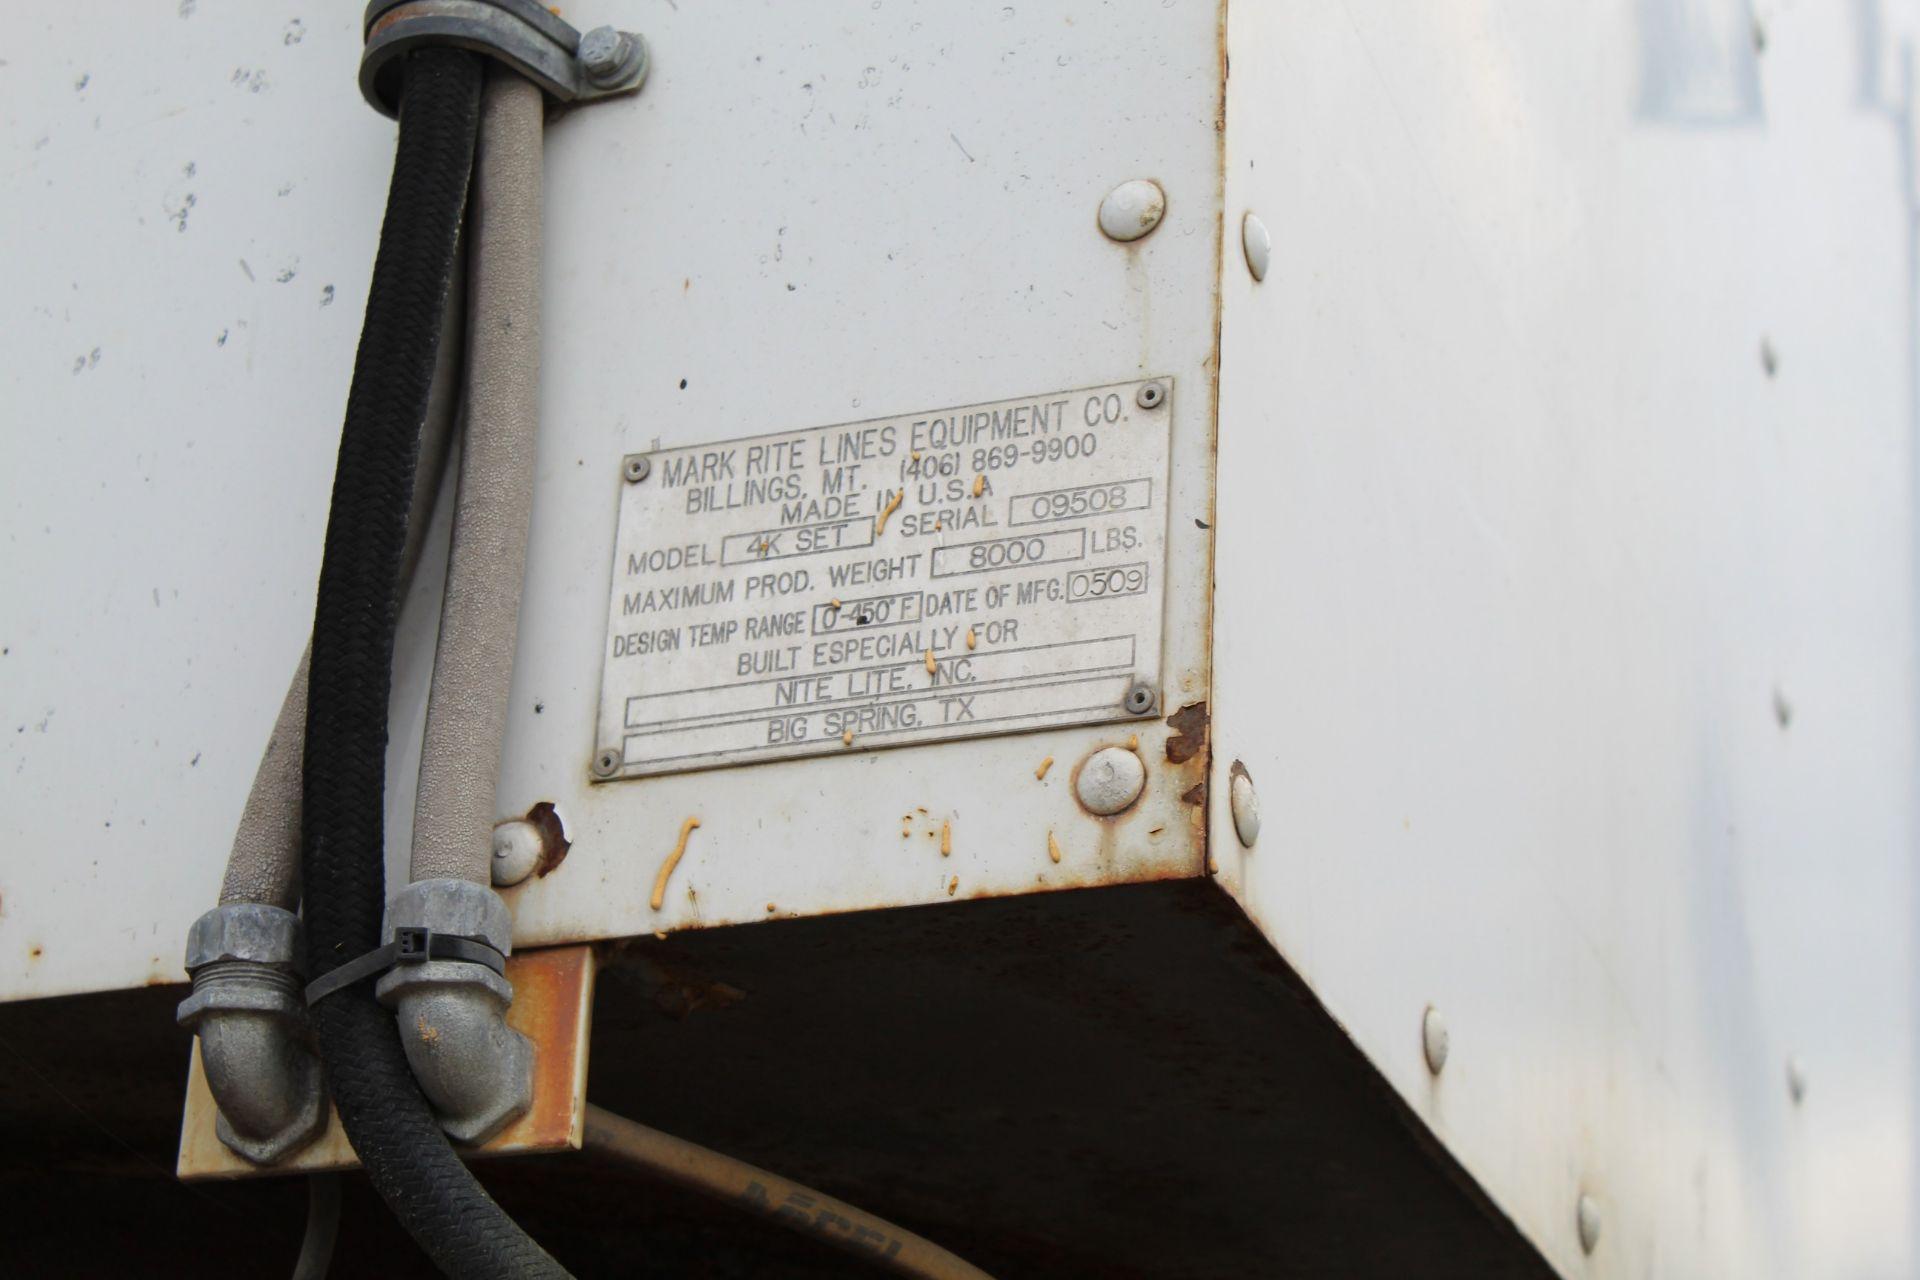 2009 MRL Skid Mounted 8,000lb Pre Melt Kettle, Model 4K SET s/n 09508 (Buyer is responsible for - Image 6 of 7